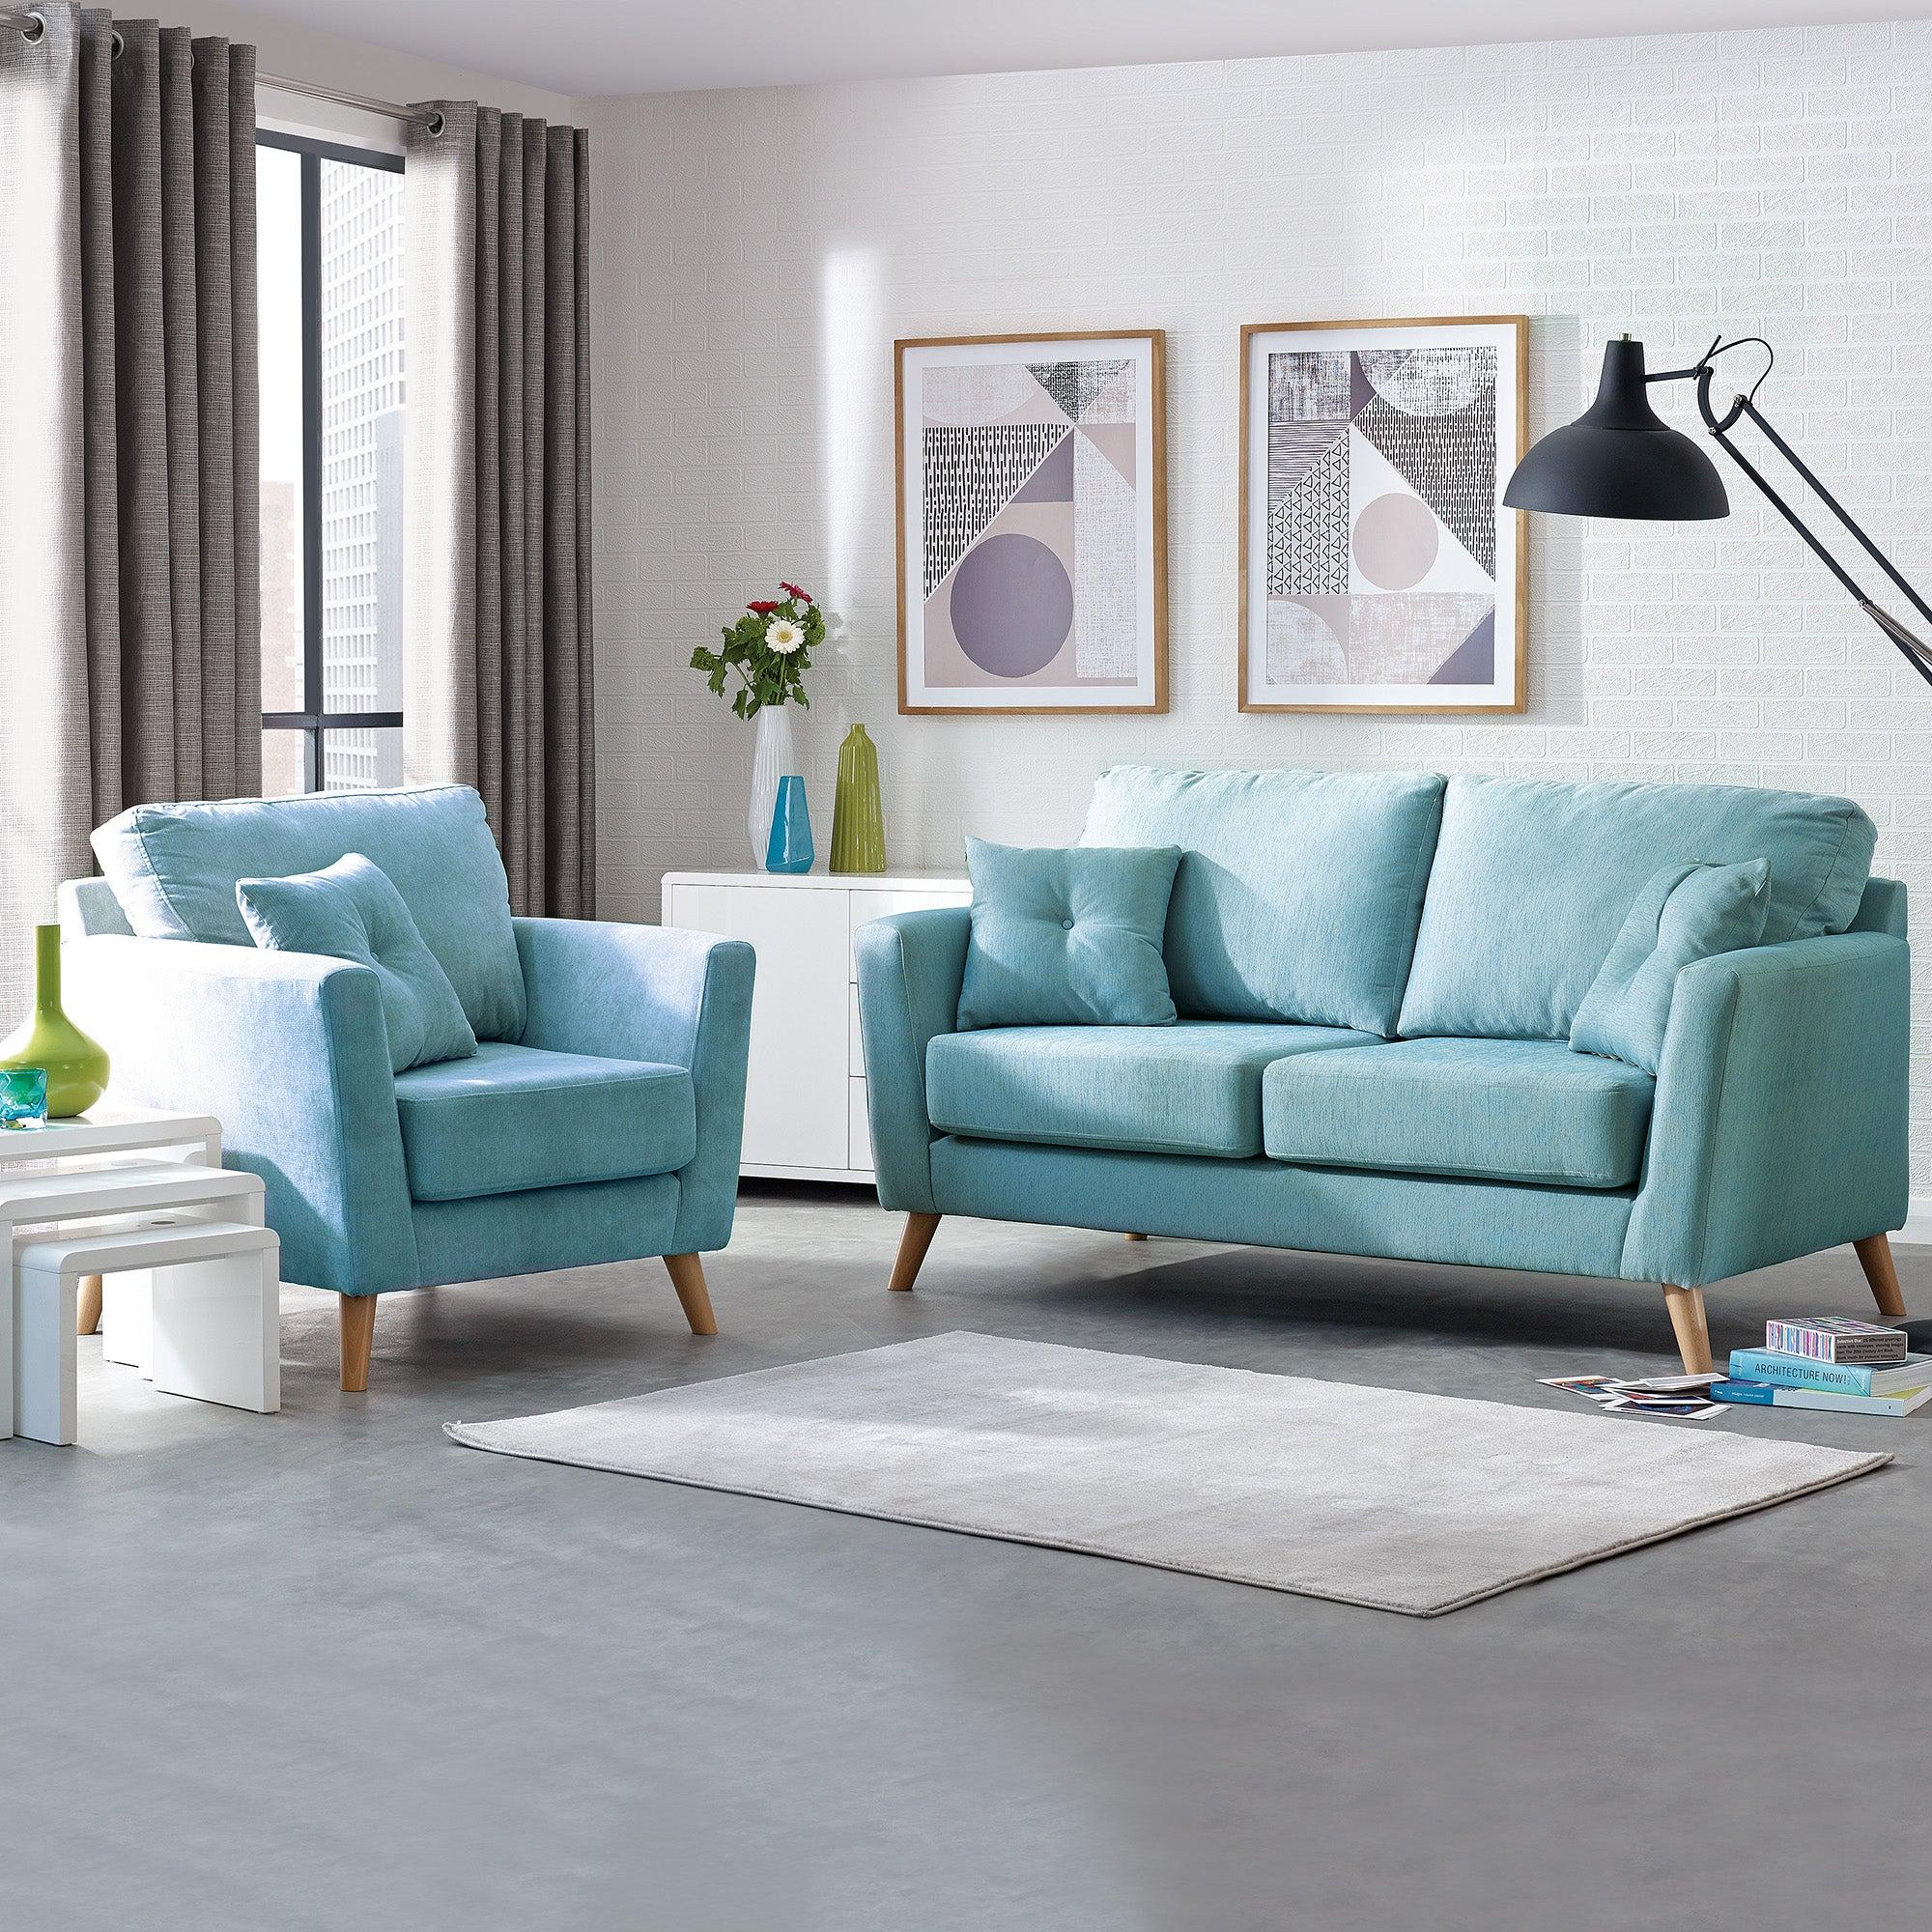 Morley Sofa Collection